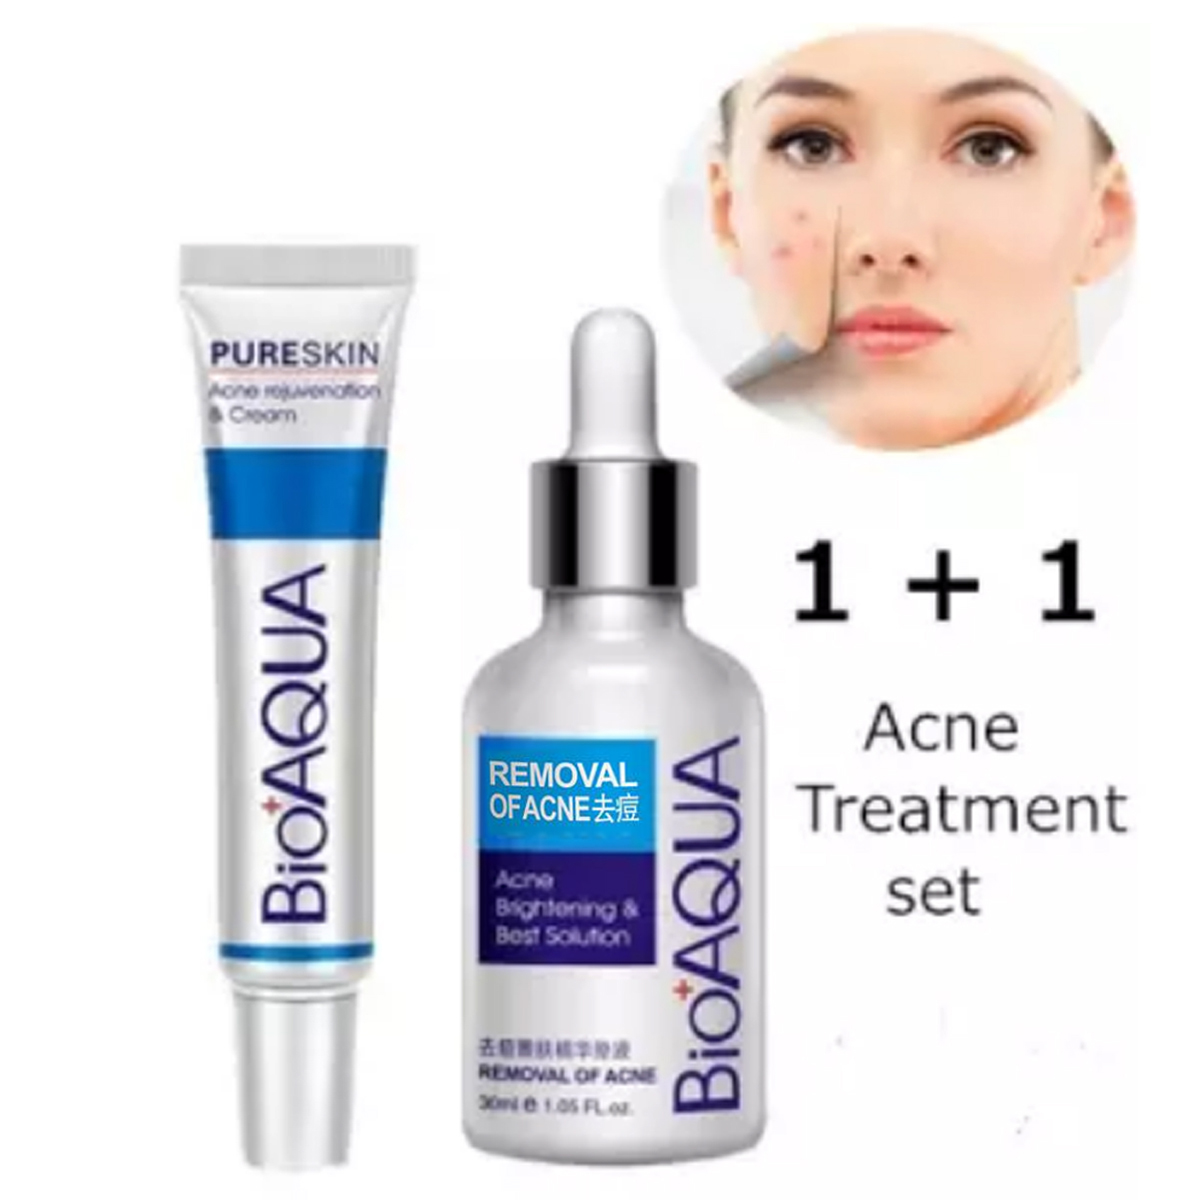 BIOAQUA 2 Pcs Anti Acne Removal Face Care Acne Treatment Set Acne Serum and Acne Scar Removal Cream